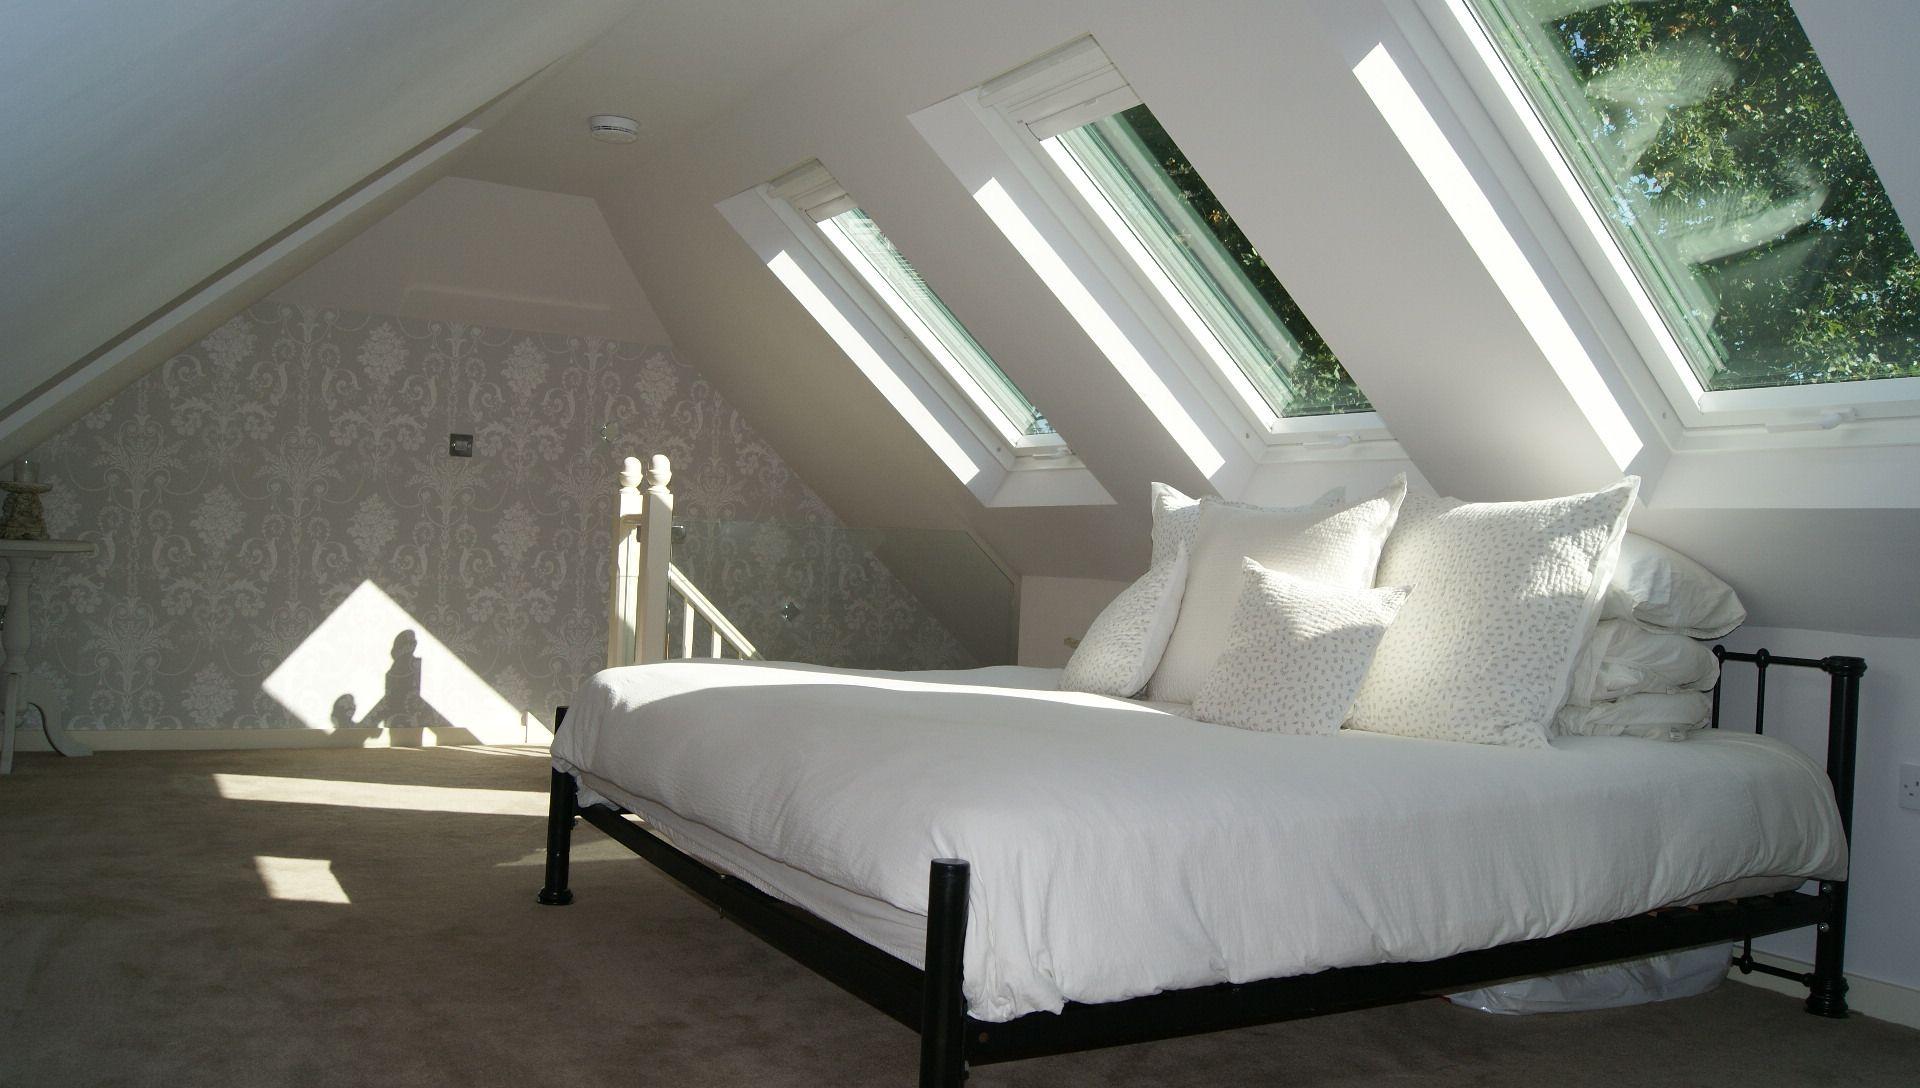 Loft bedroom windows  Velux Window Conversion  Living rooms  Pinterest  Window Lofts